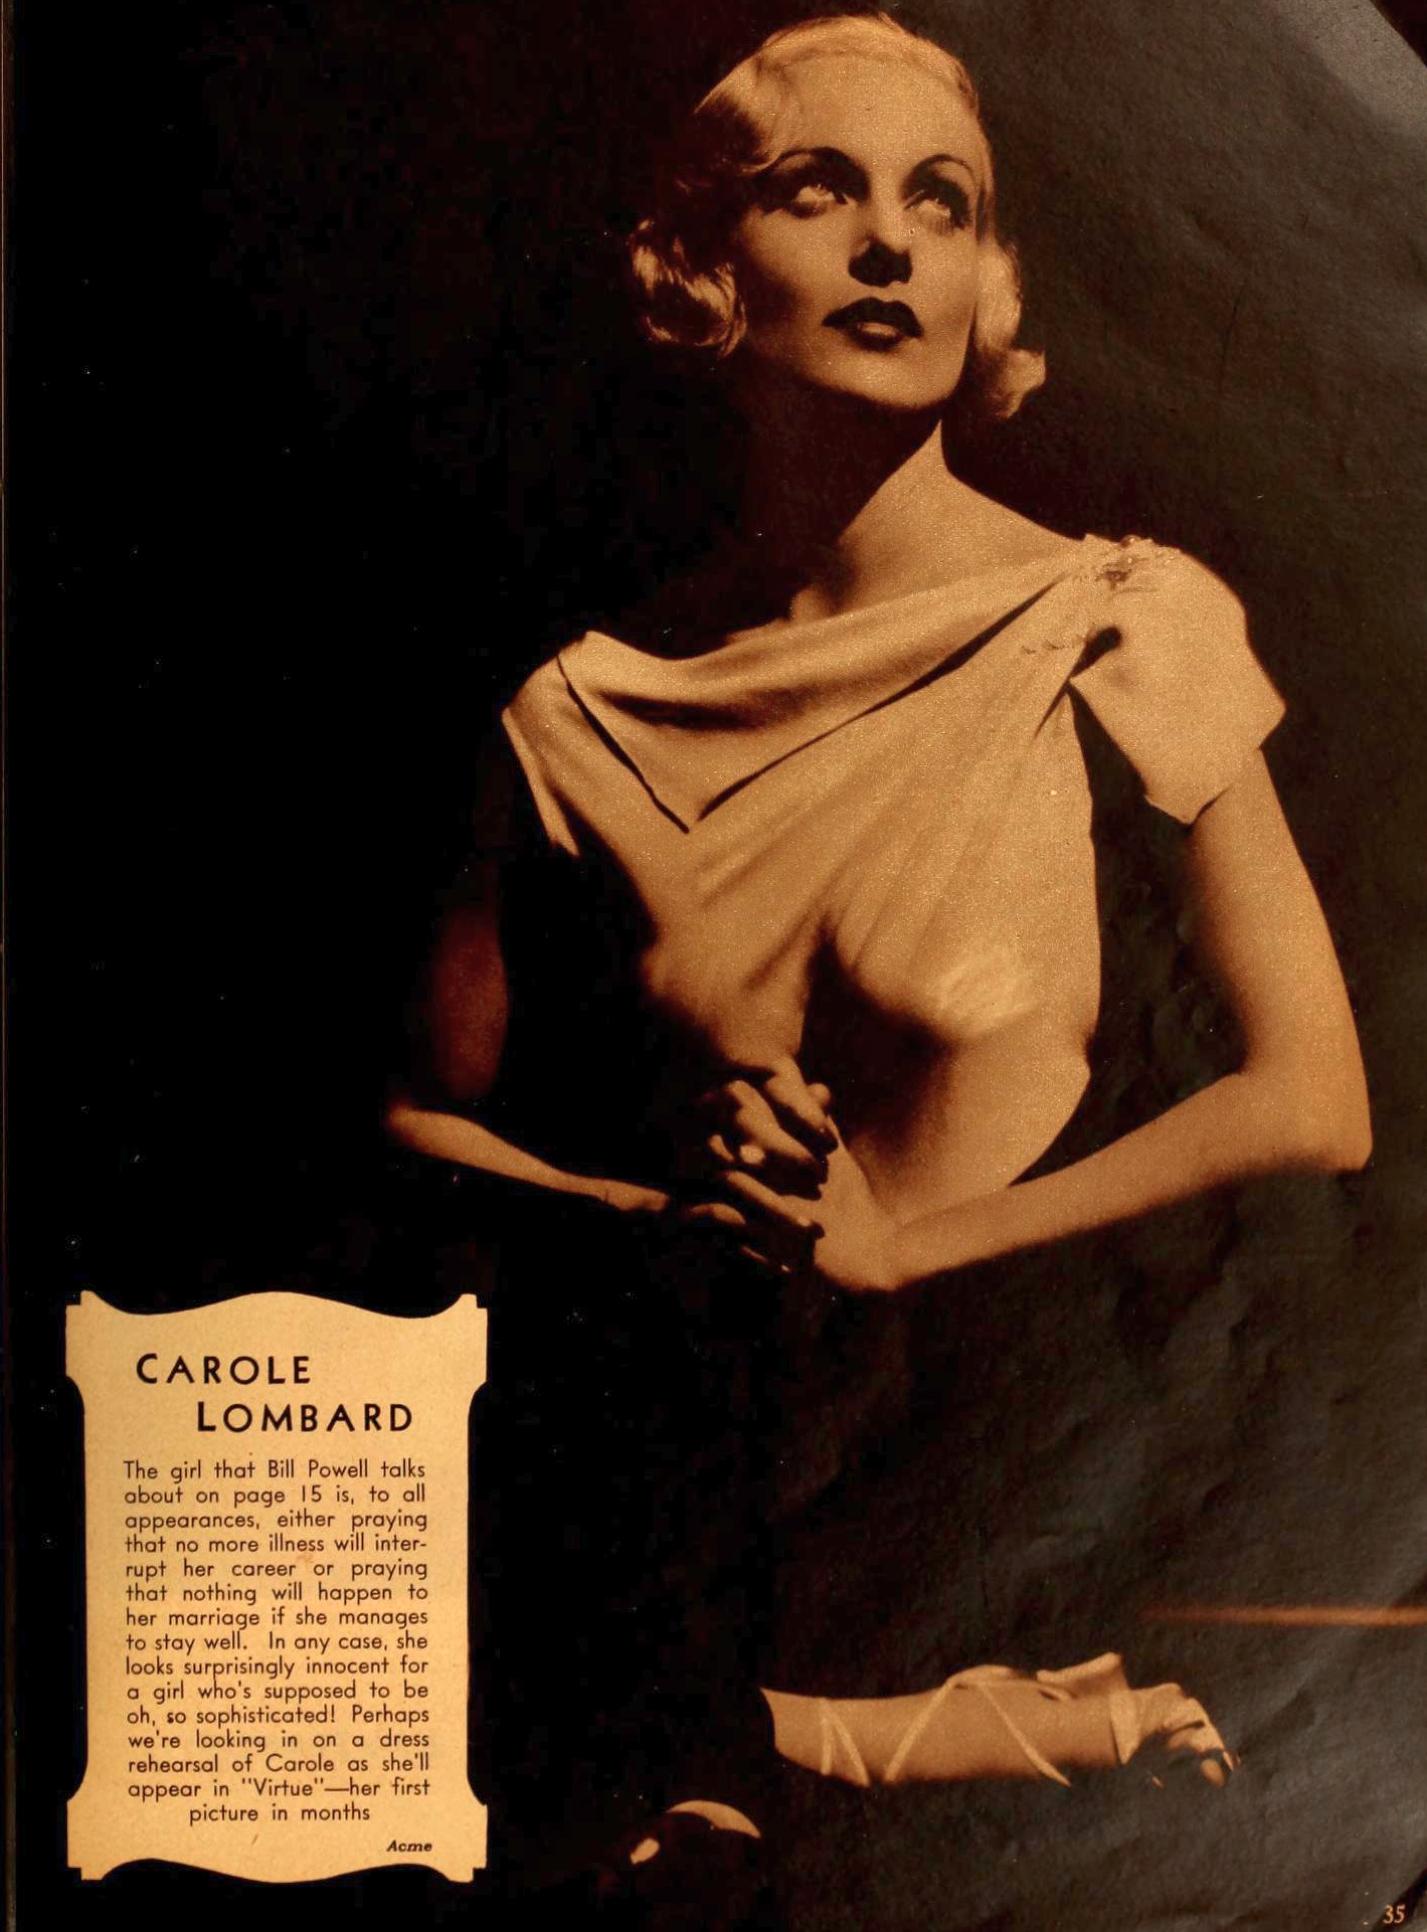 carole lombard movie classic november 1932a